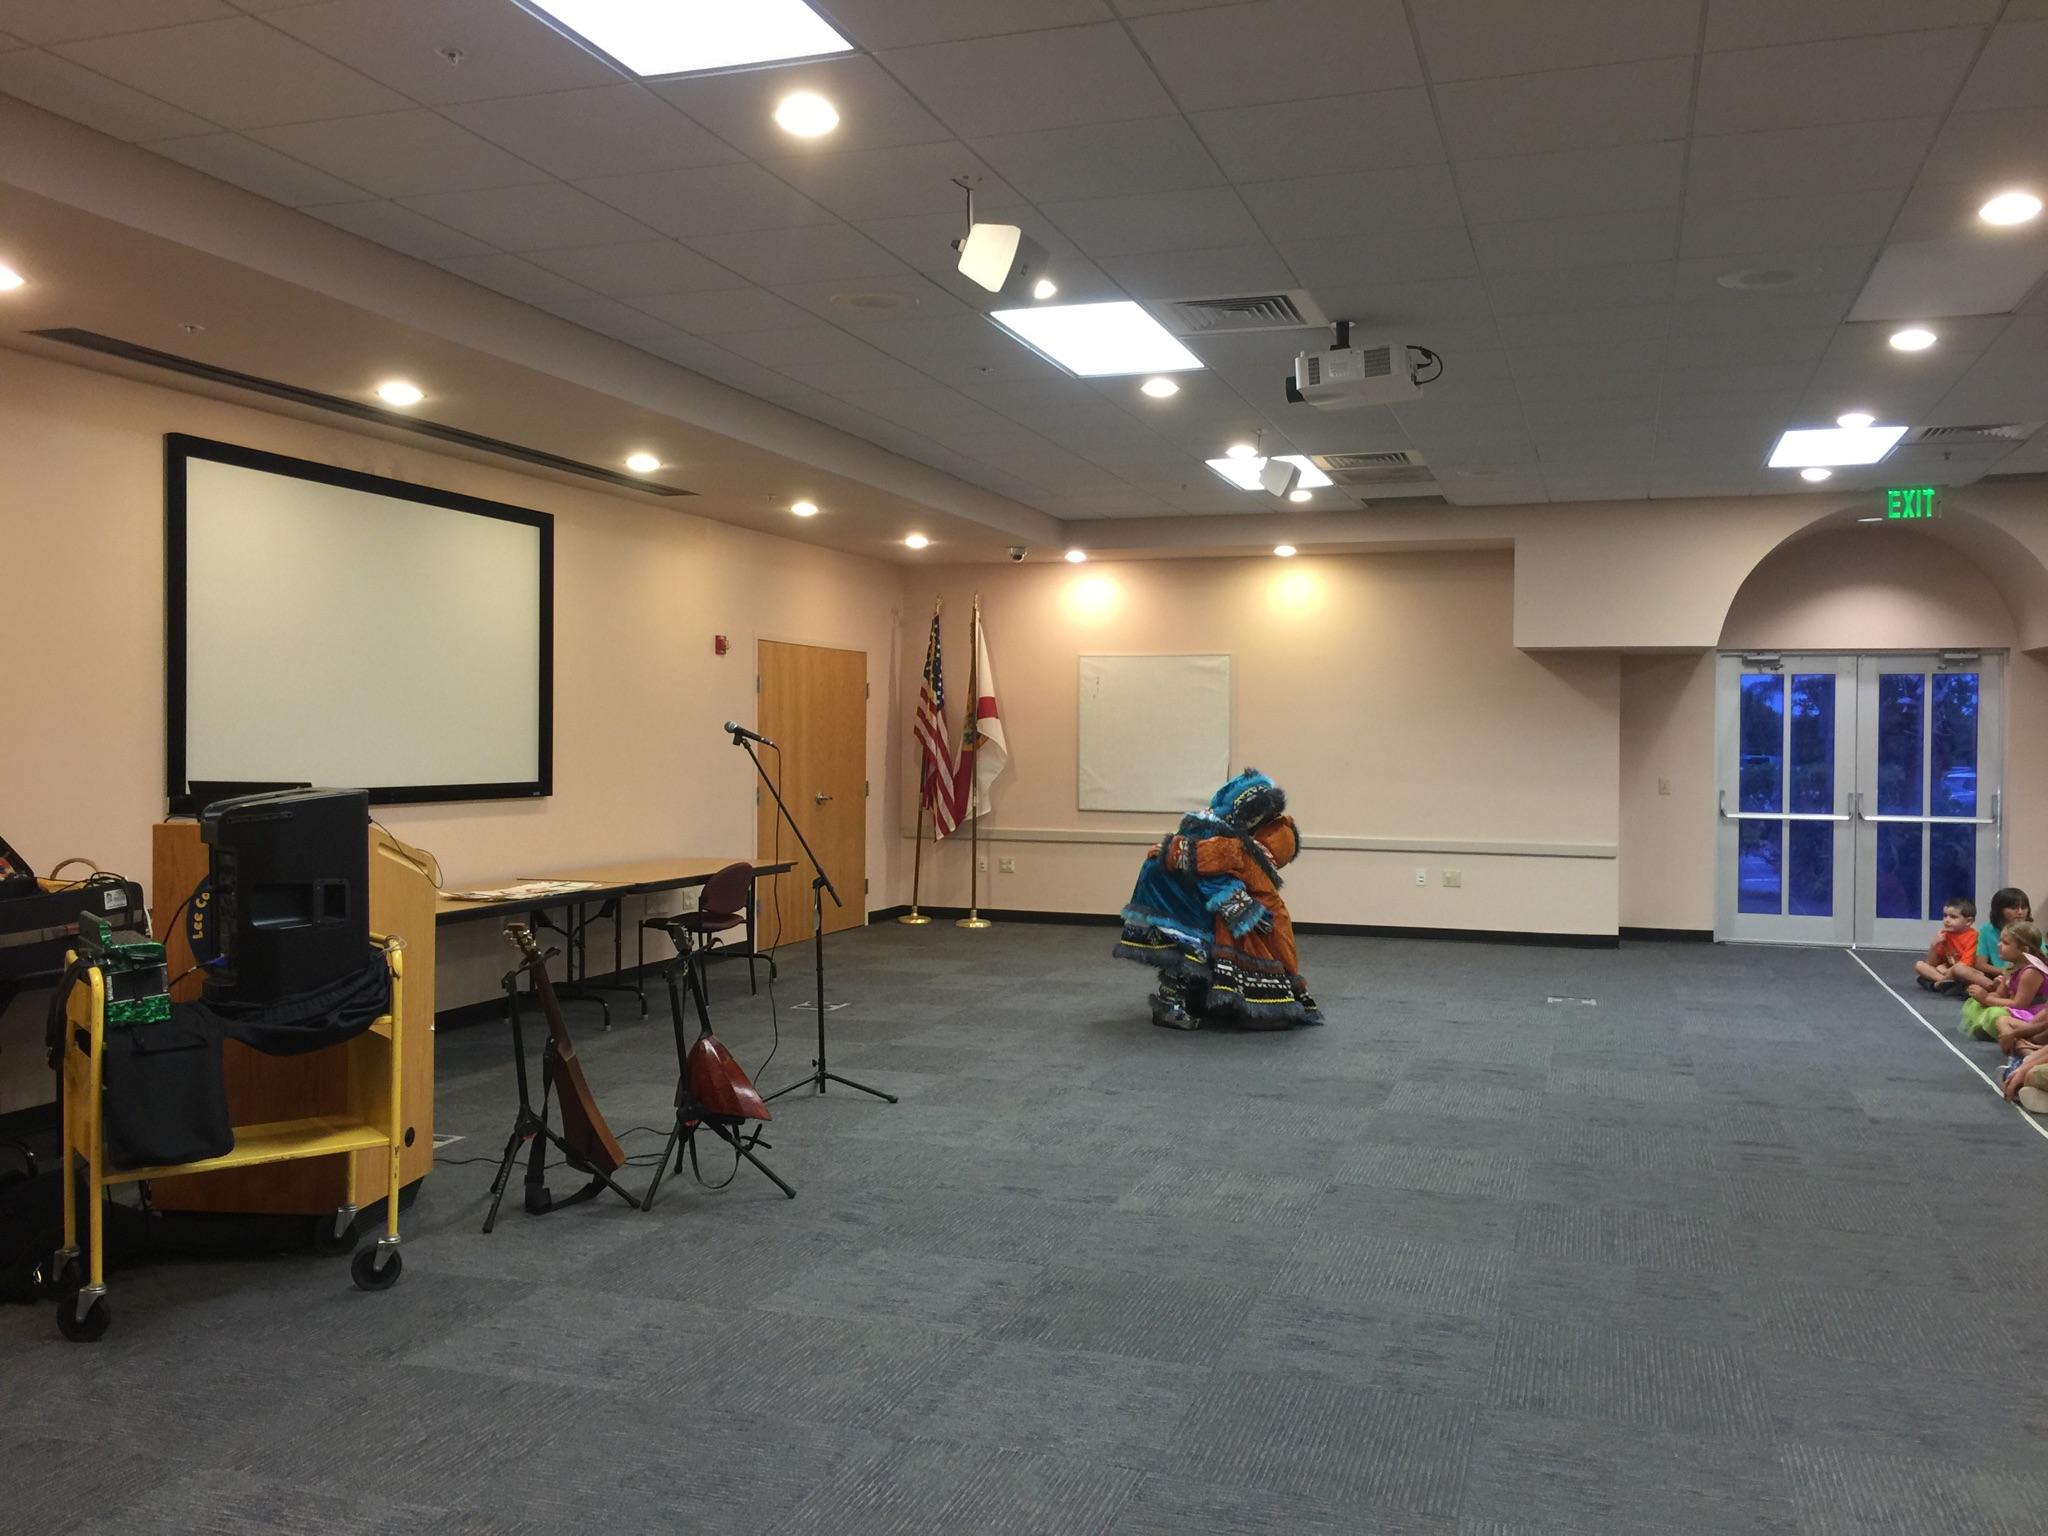 Illinois lee county lee - Russian Balalaika Duo Mikhail Smirnov Elina Karokhina Cape Coral Lee County Florida Cape Coral Lee County Public Library